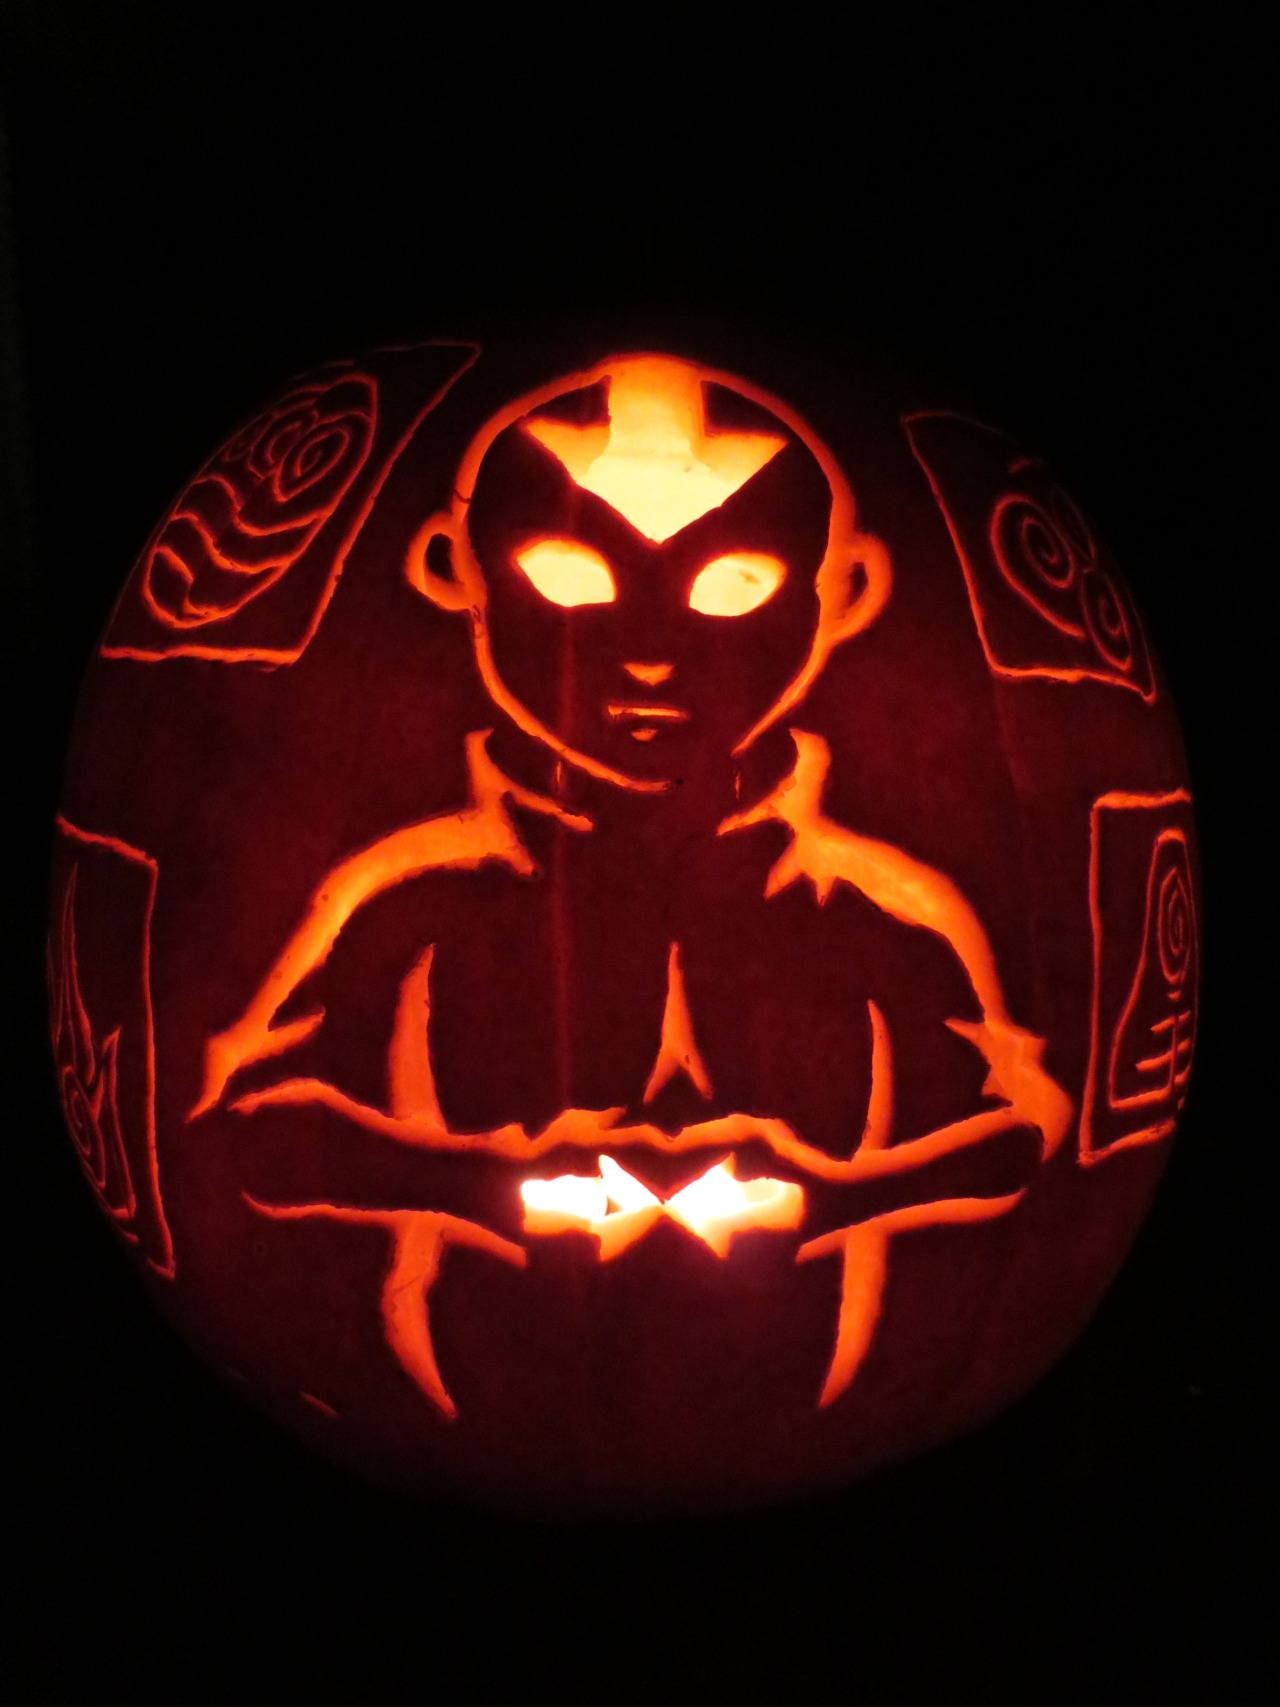 Pumpkin Halloween Carving Jack O Lantern Calabaza Cucurbita Jpg 1280x1707 Betty Boop Template